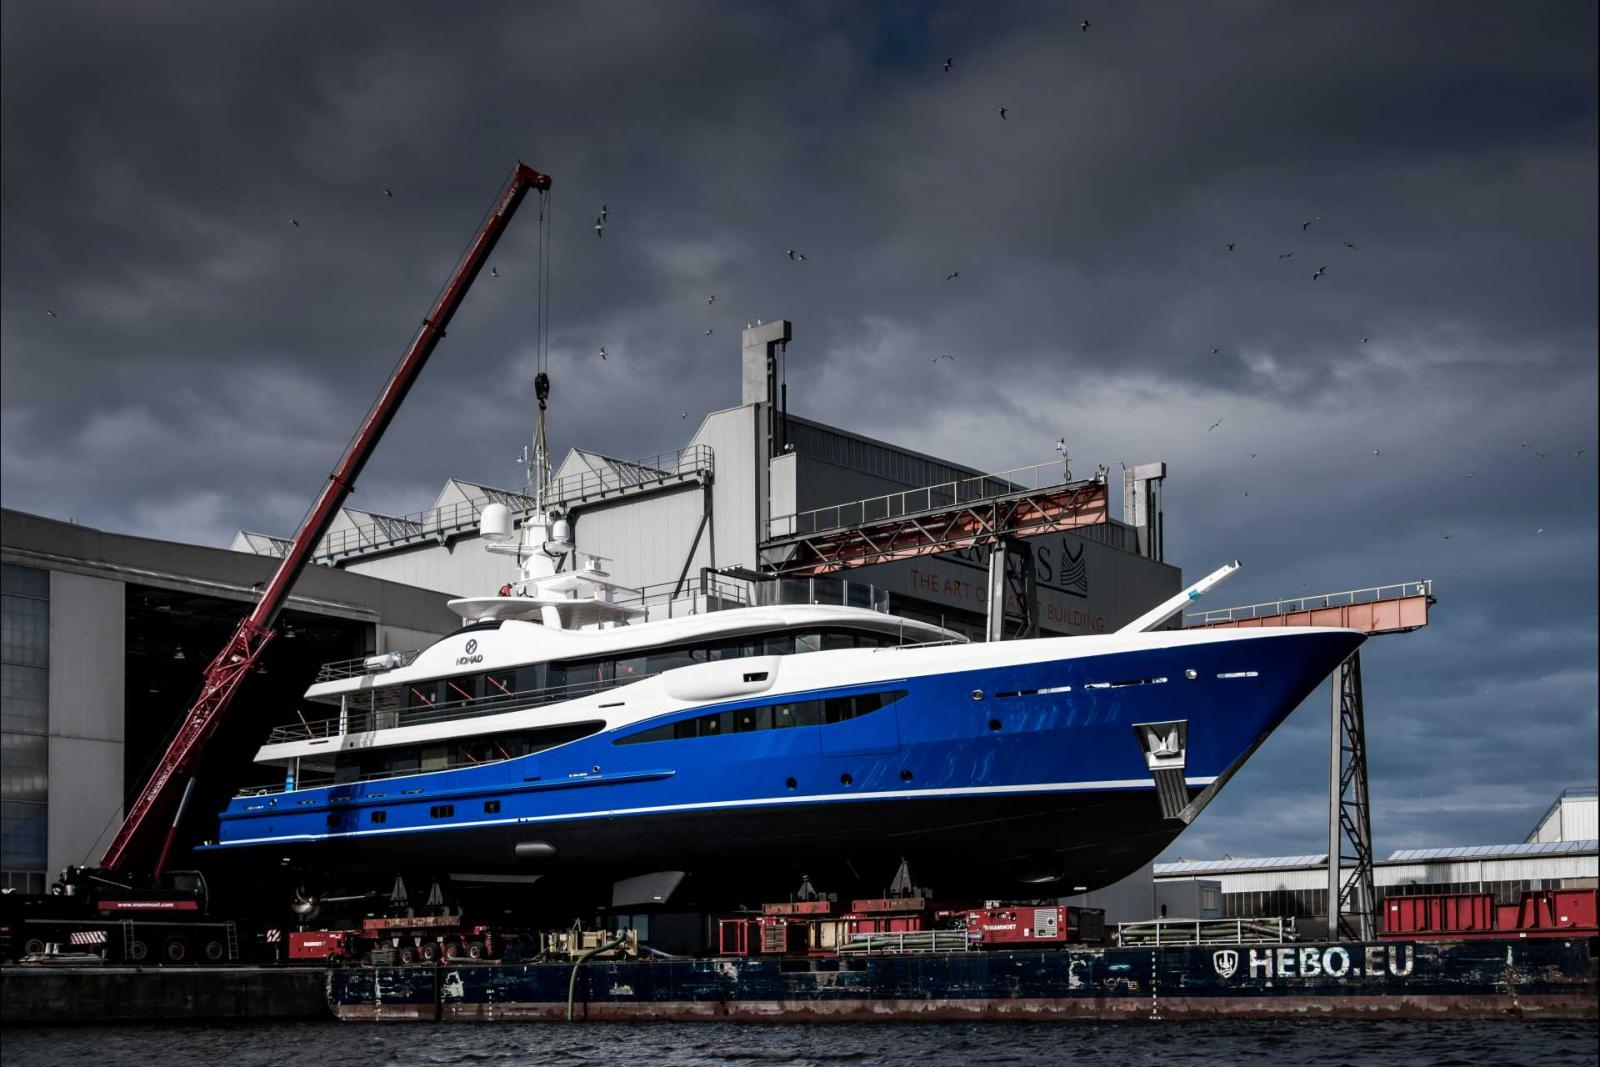 Amels Yacht Nomad 180